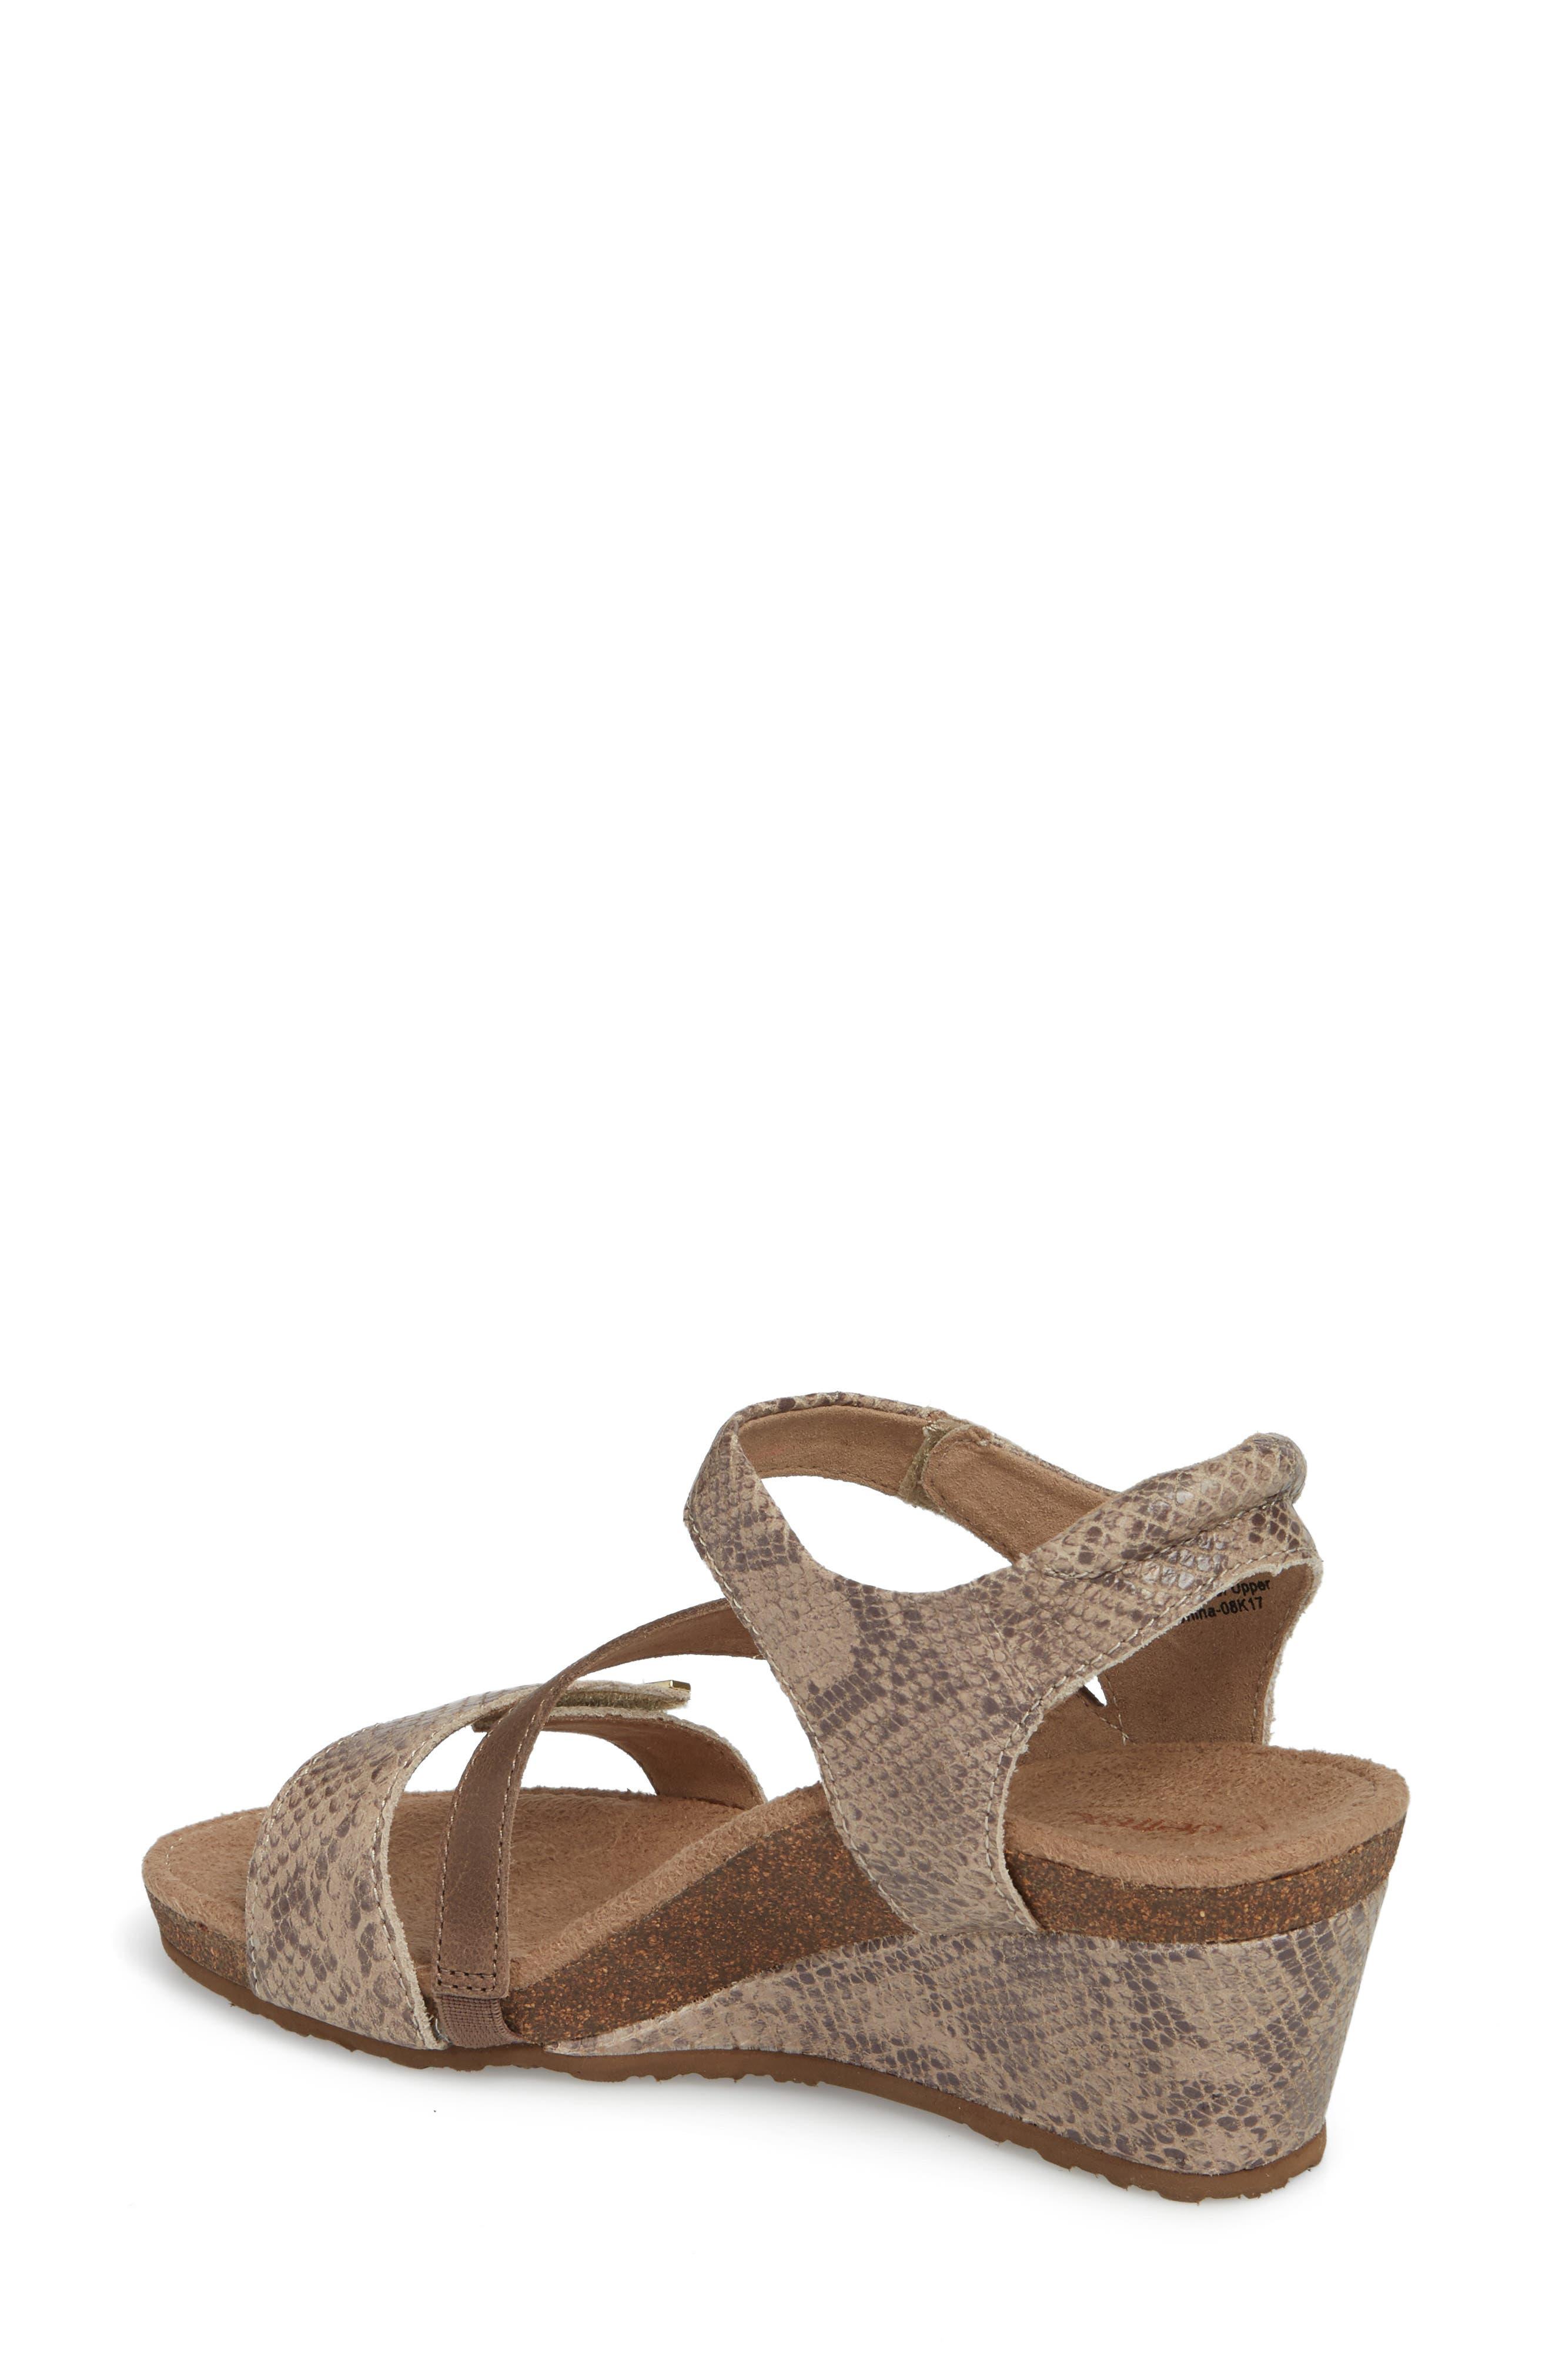 Brynn Asymmetrical Wedge Sandal,                             Alternate thumbnail 2, color,                             STONE SNAKE LEATHER